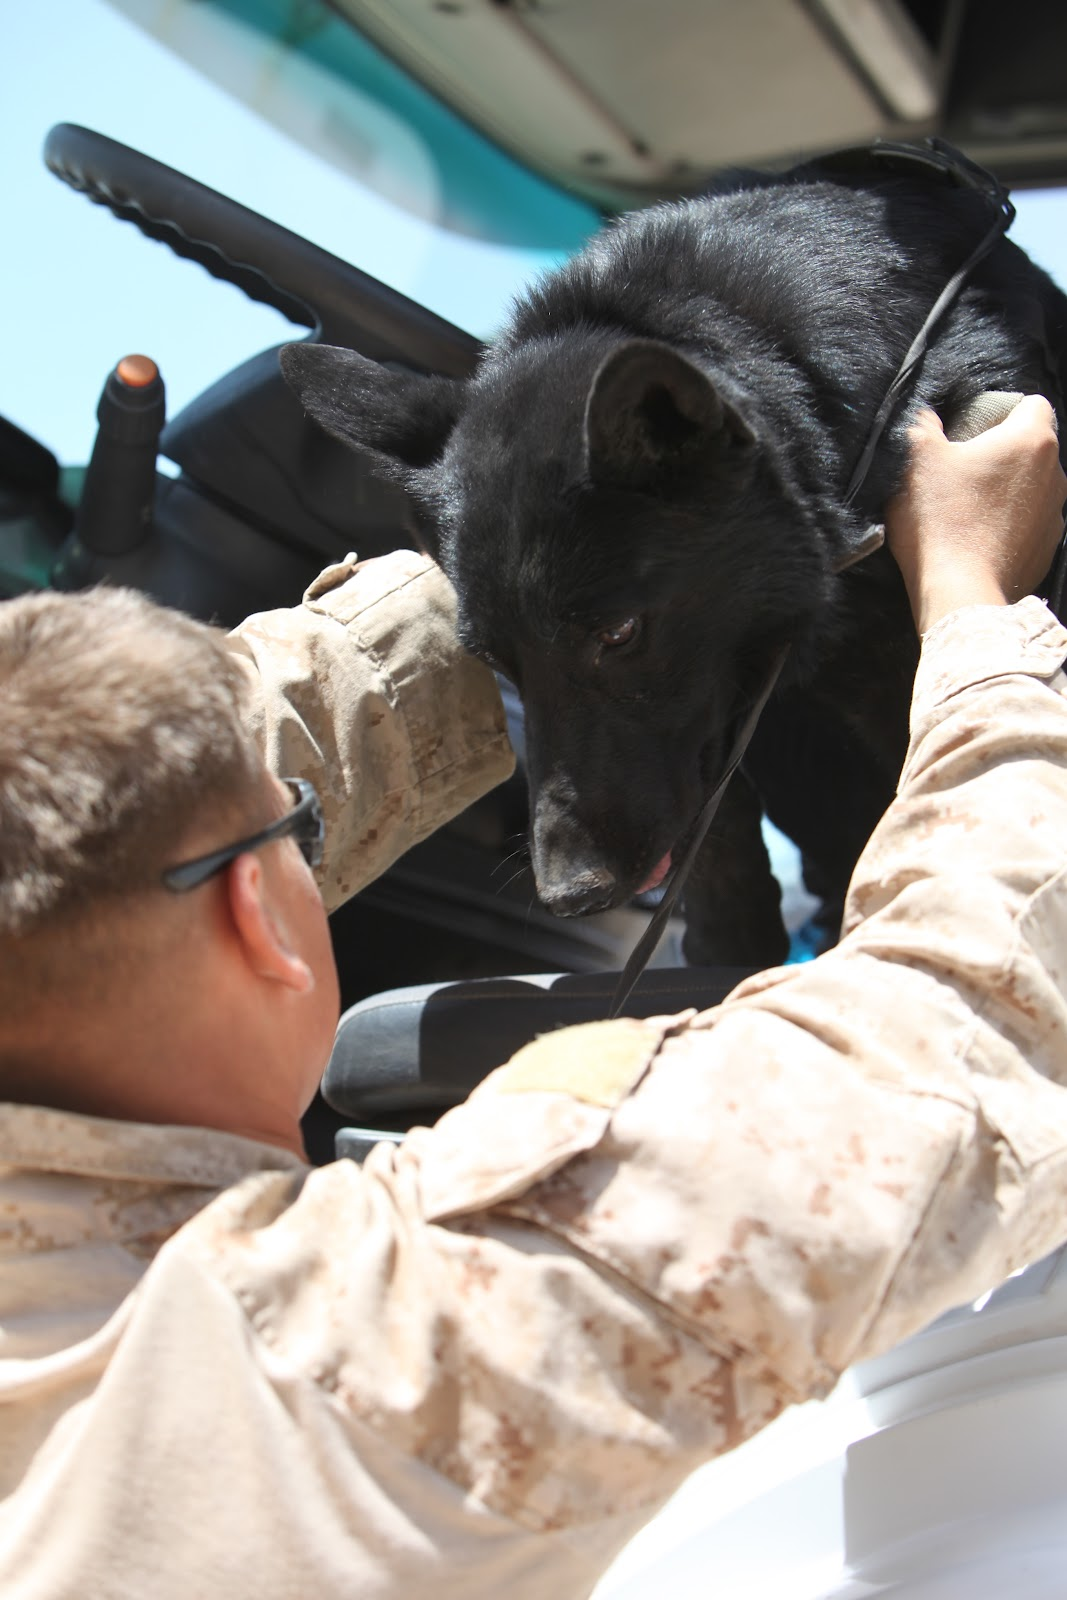 Cpl. Seth Sheppard and military canine Fenji